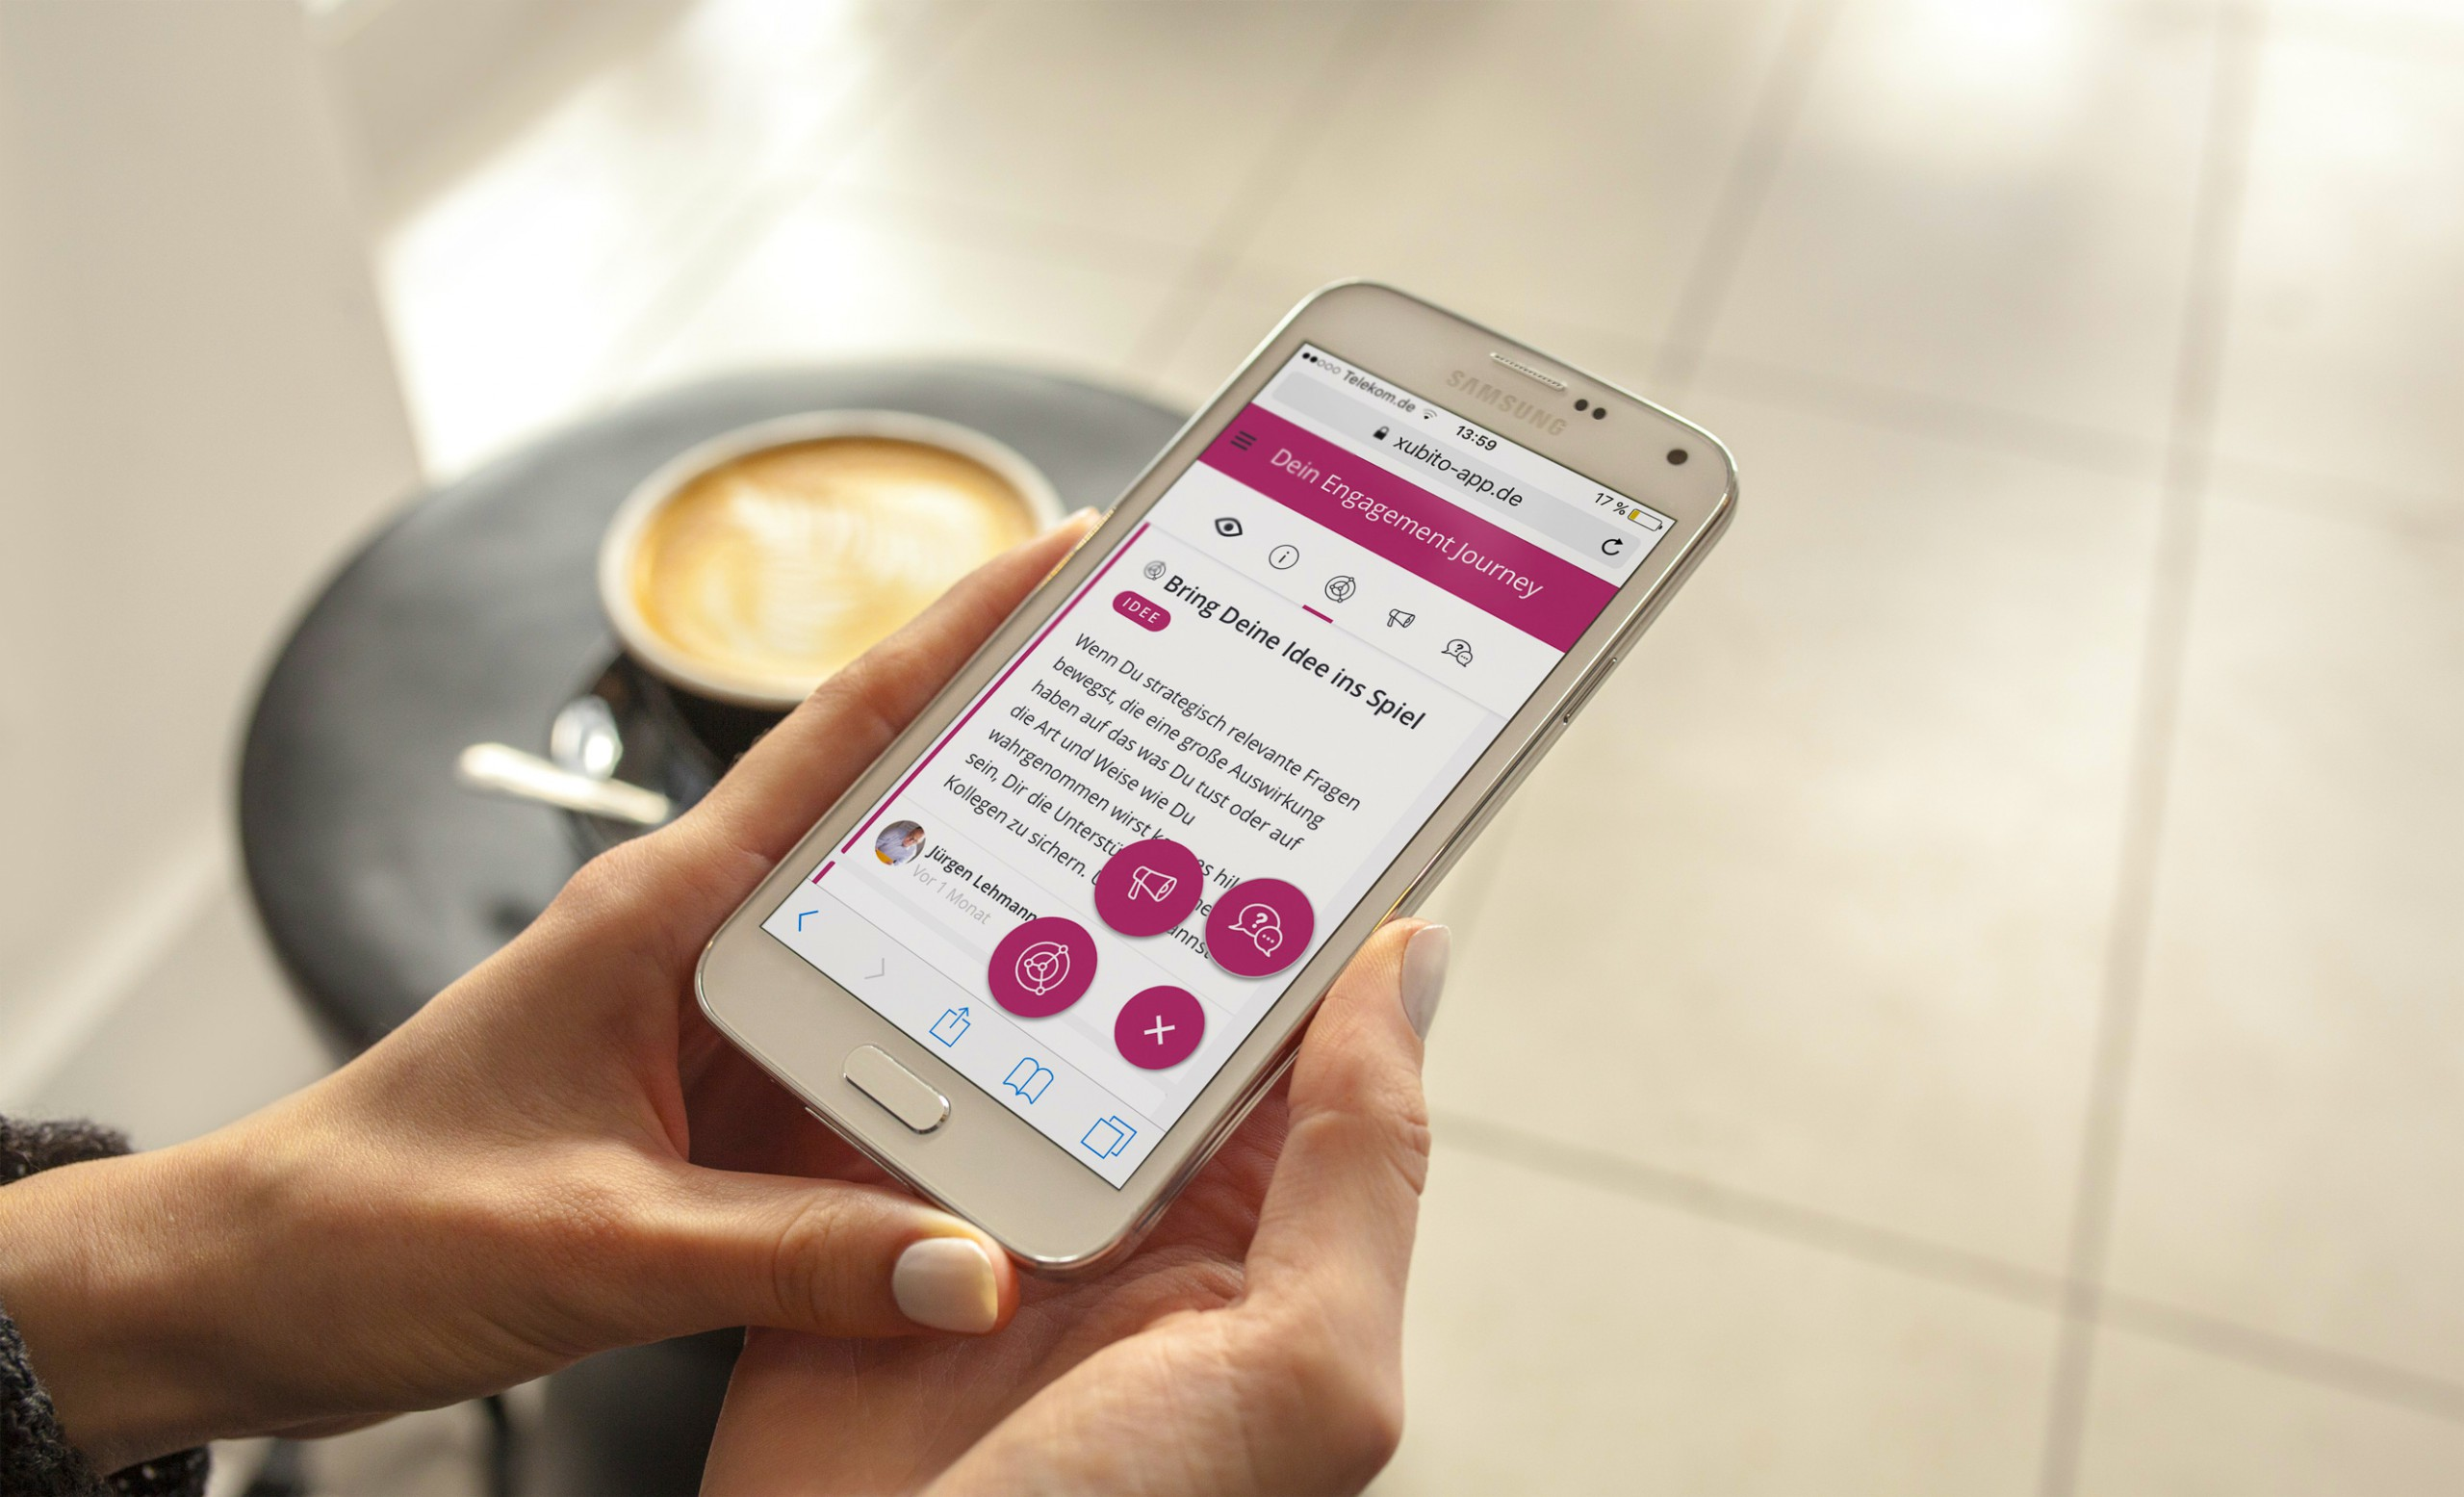 Xubito Veränderungsbegleitung per App